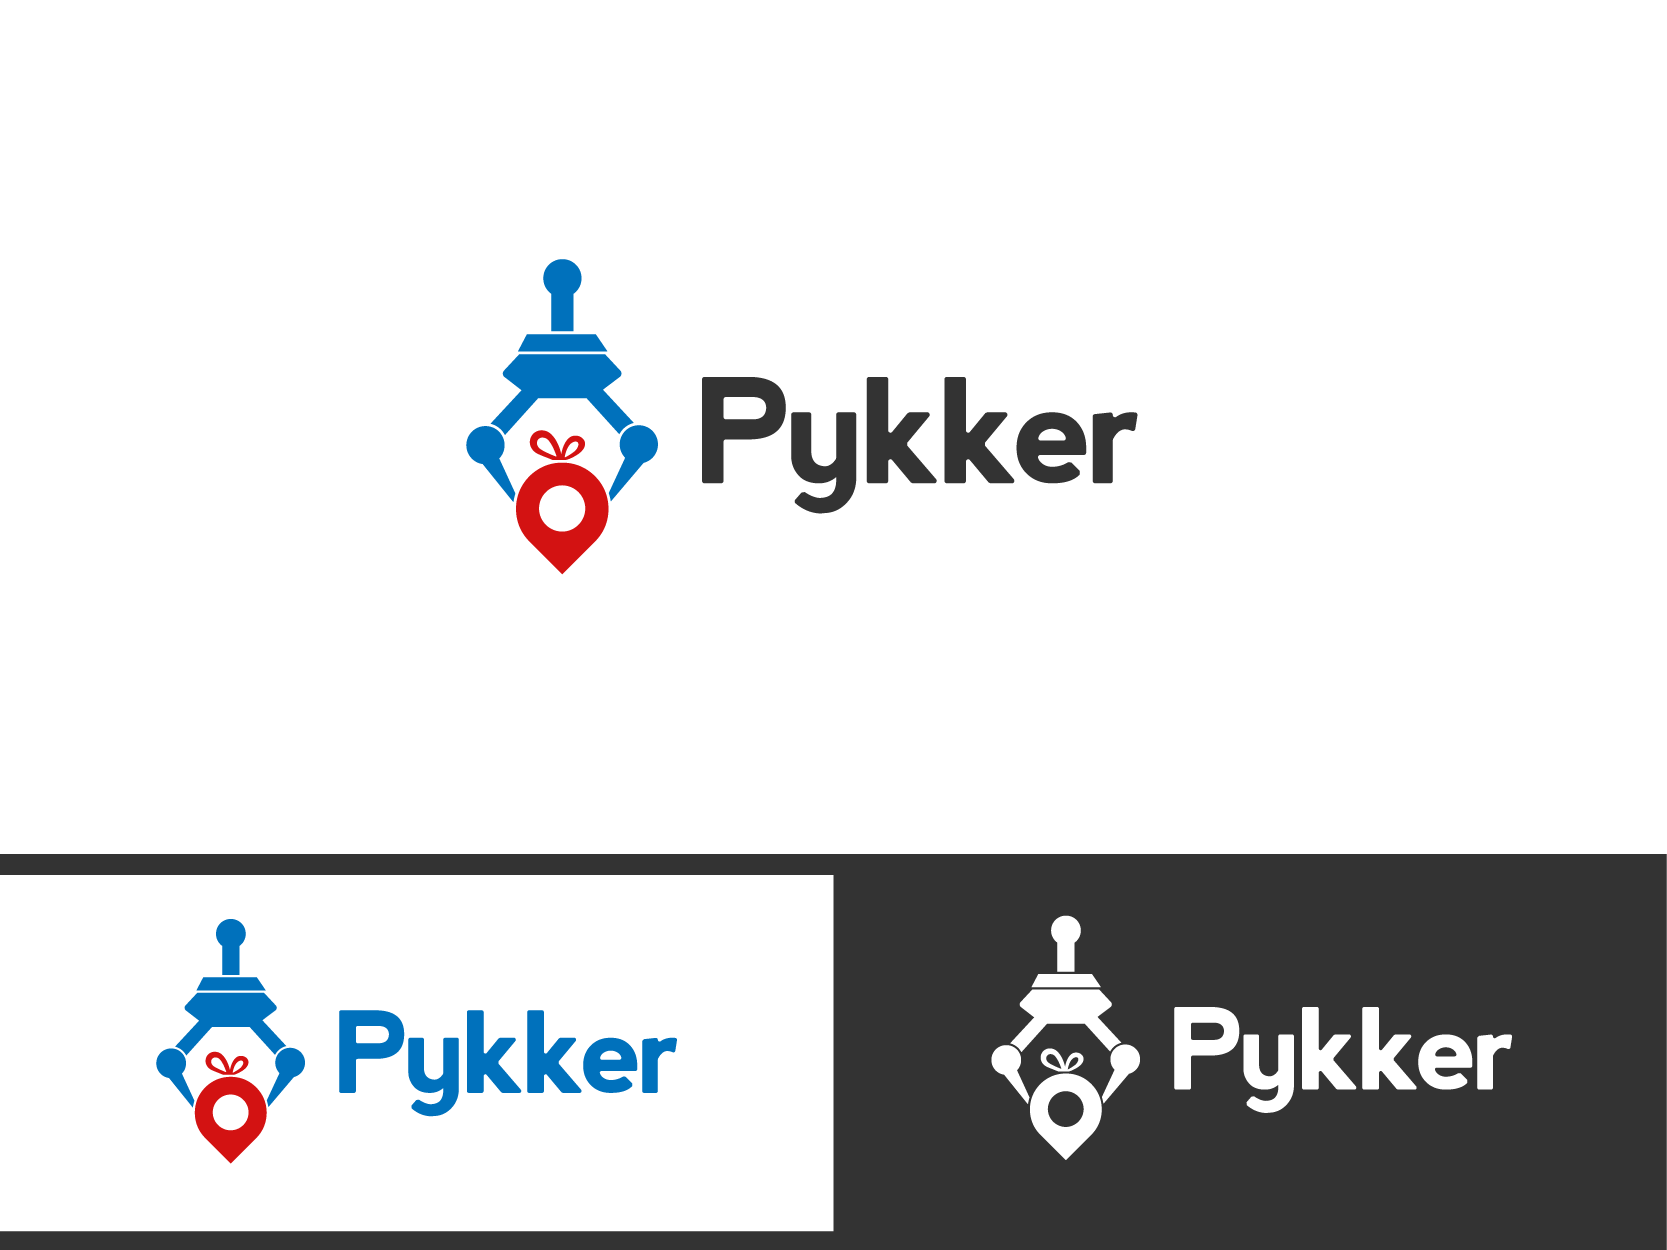 Create a unique logo for a location-based rewards application